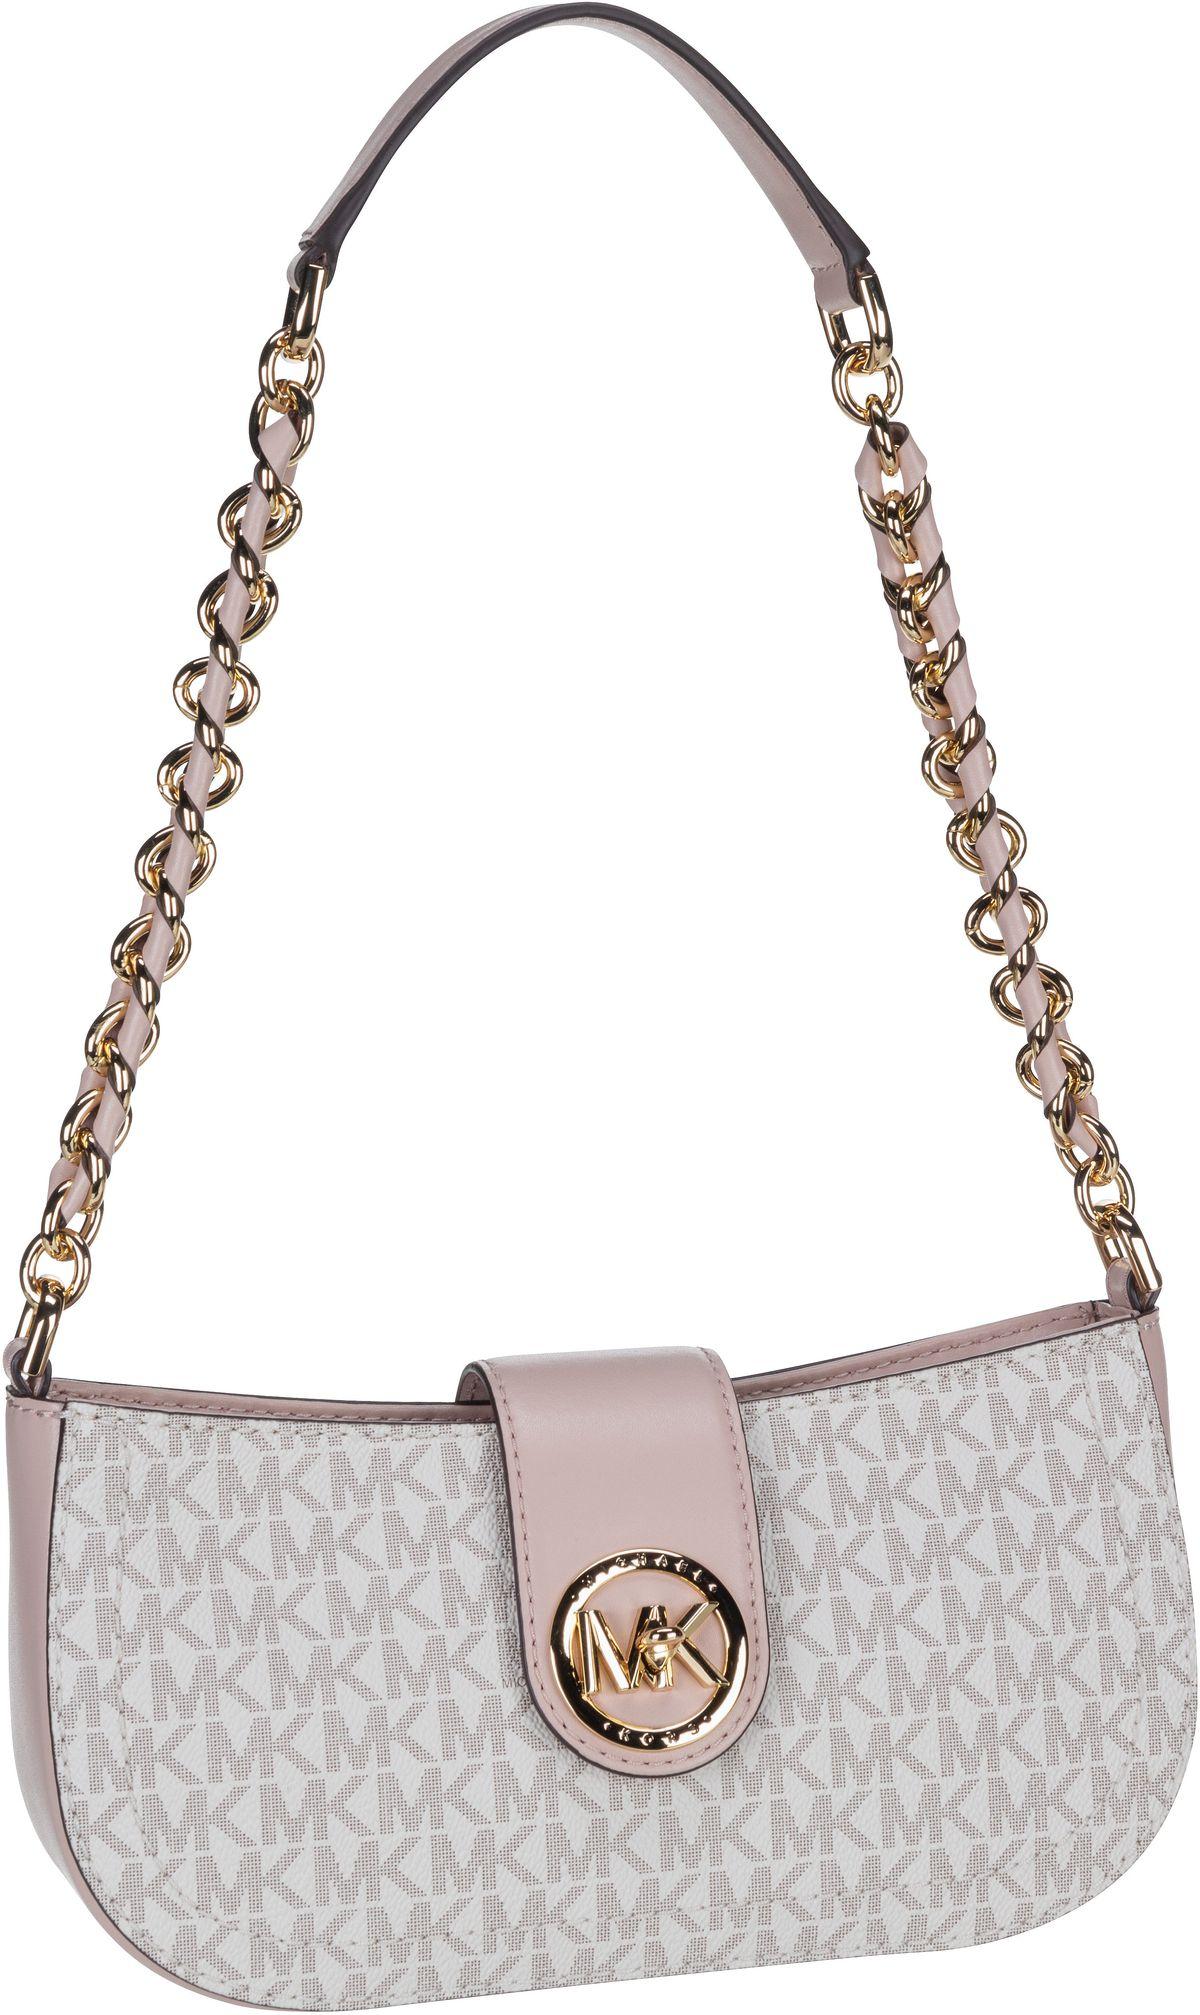 Michael Kors Handtasche Carmen XS Pouchette MK Signature Vanilla/Soft Pink